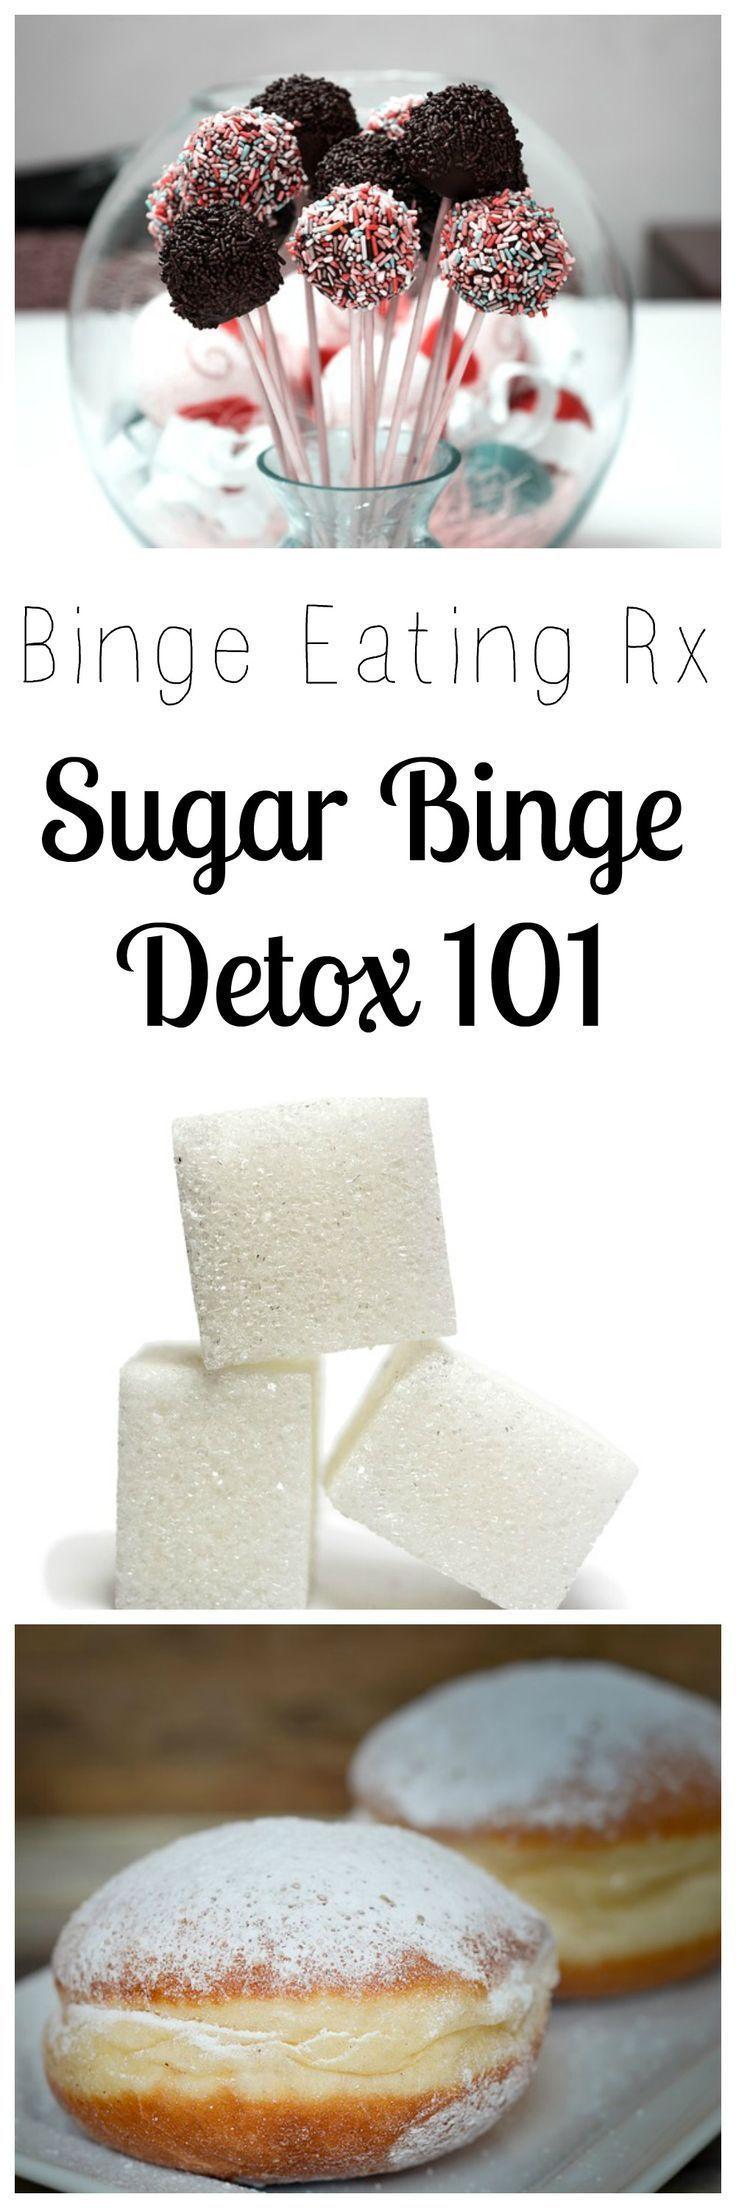 how to stop binge eating sugar